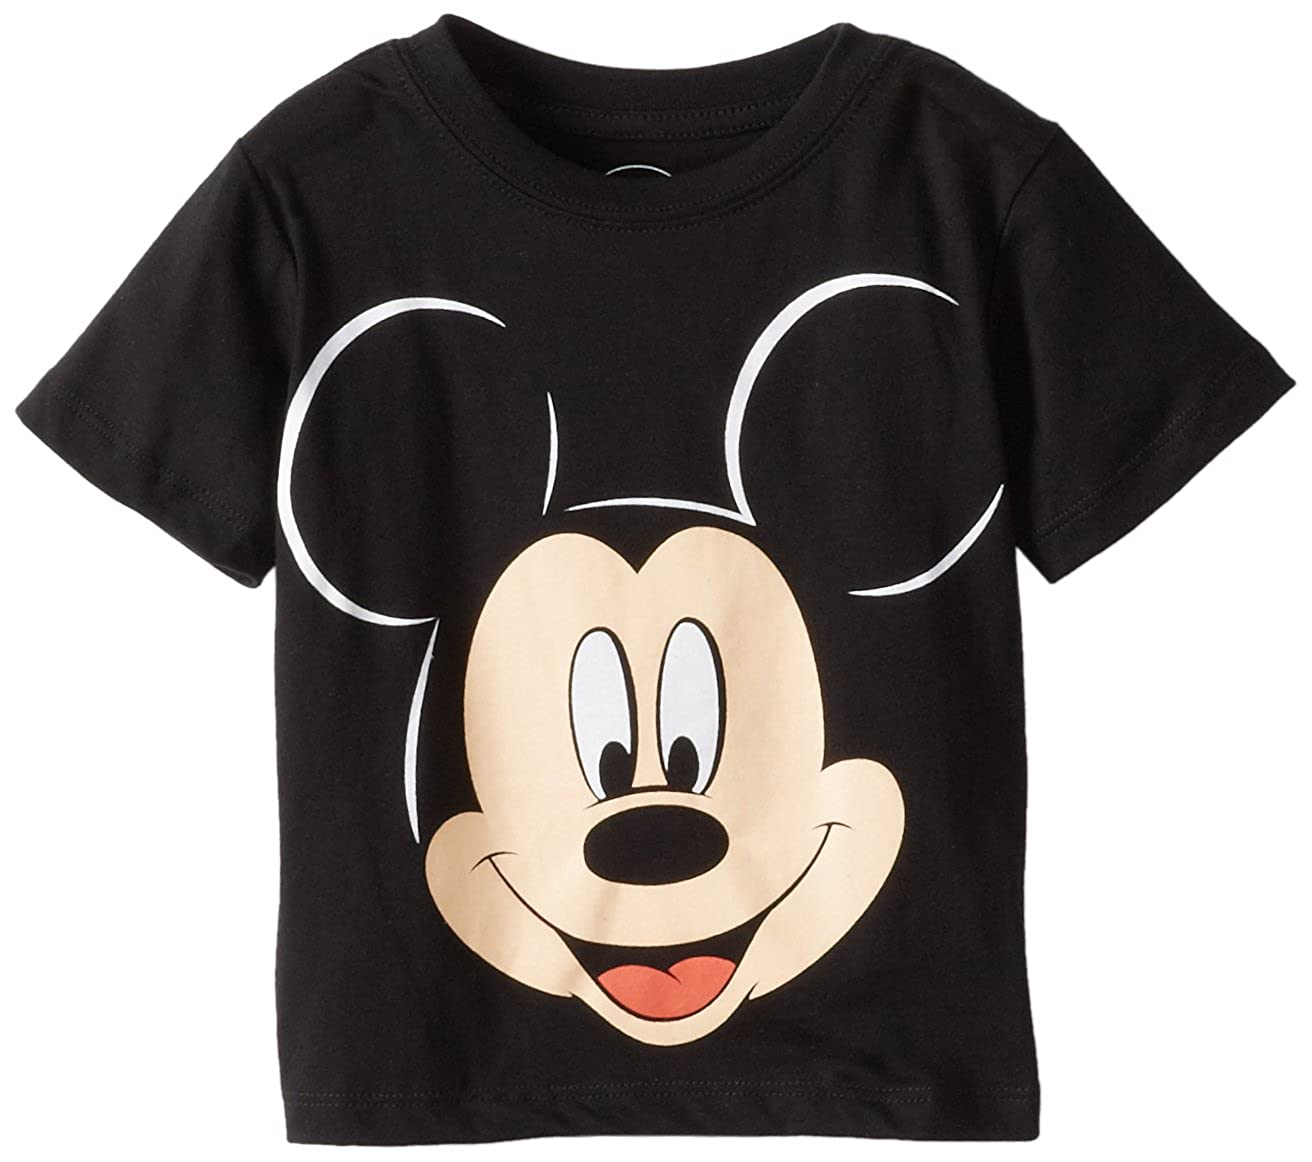 82f9634a598 Amazon.com  Disney Mickey Mouse Boys  Face T-Shirt  Fashion T Shirts   Clothing